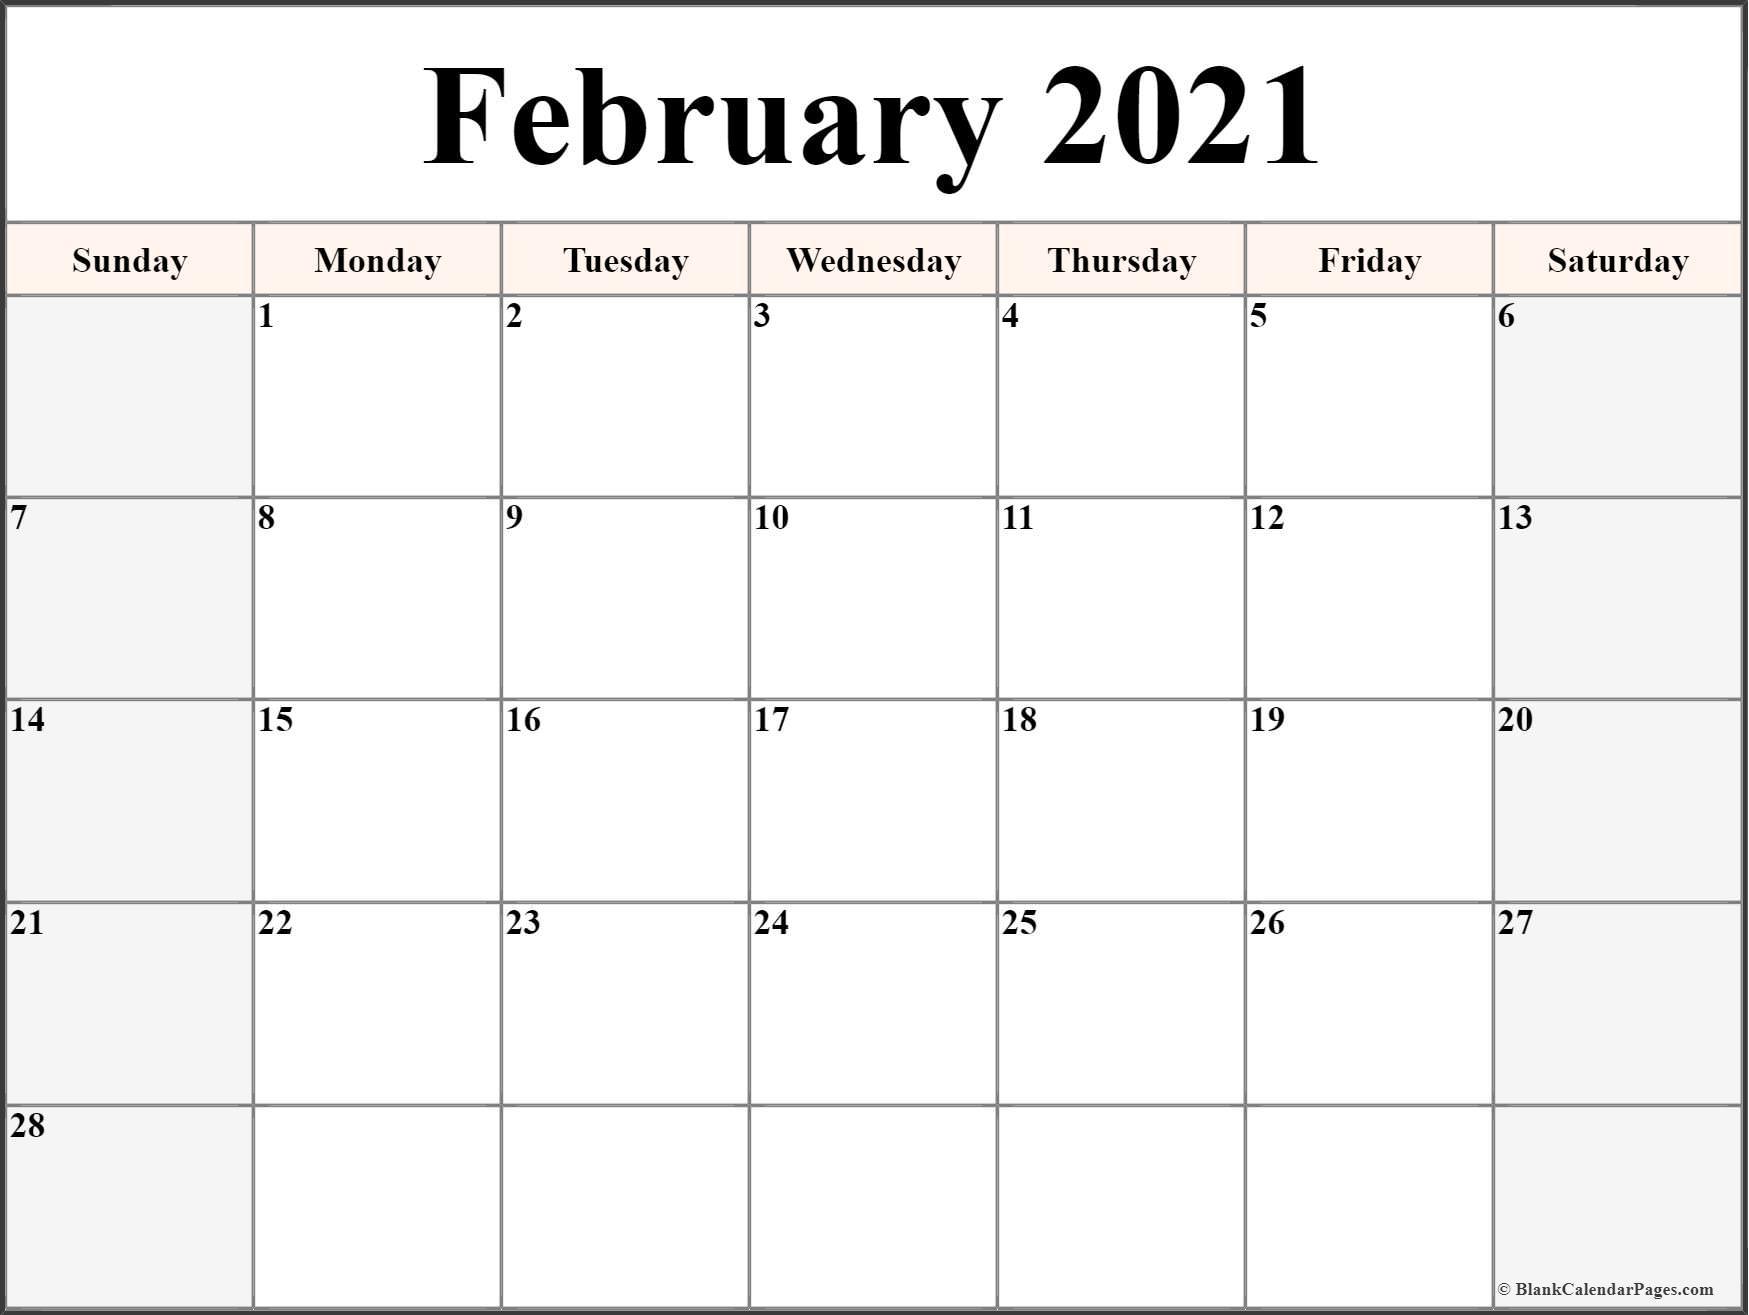 February 2021 Calendar Free Printable Monthly Calendars 1